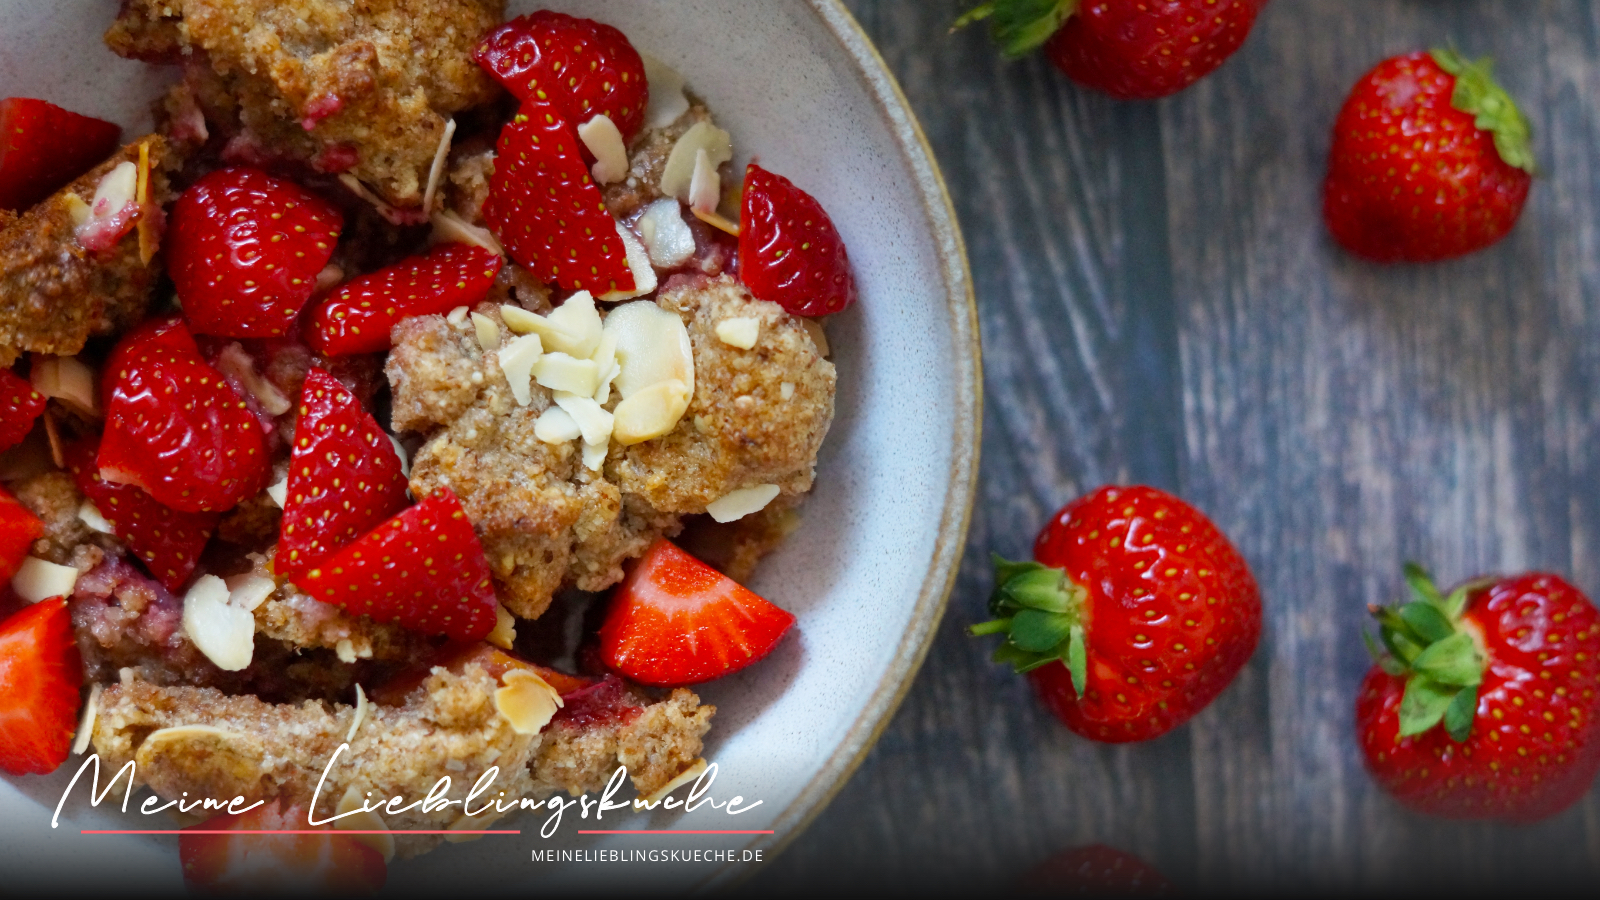 Apfel-Erdbeer-Crumble